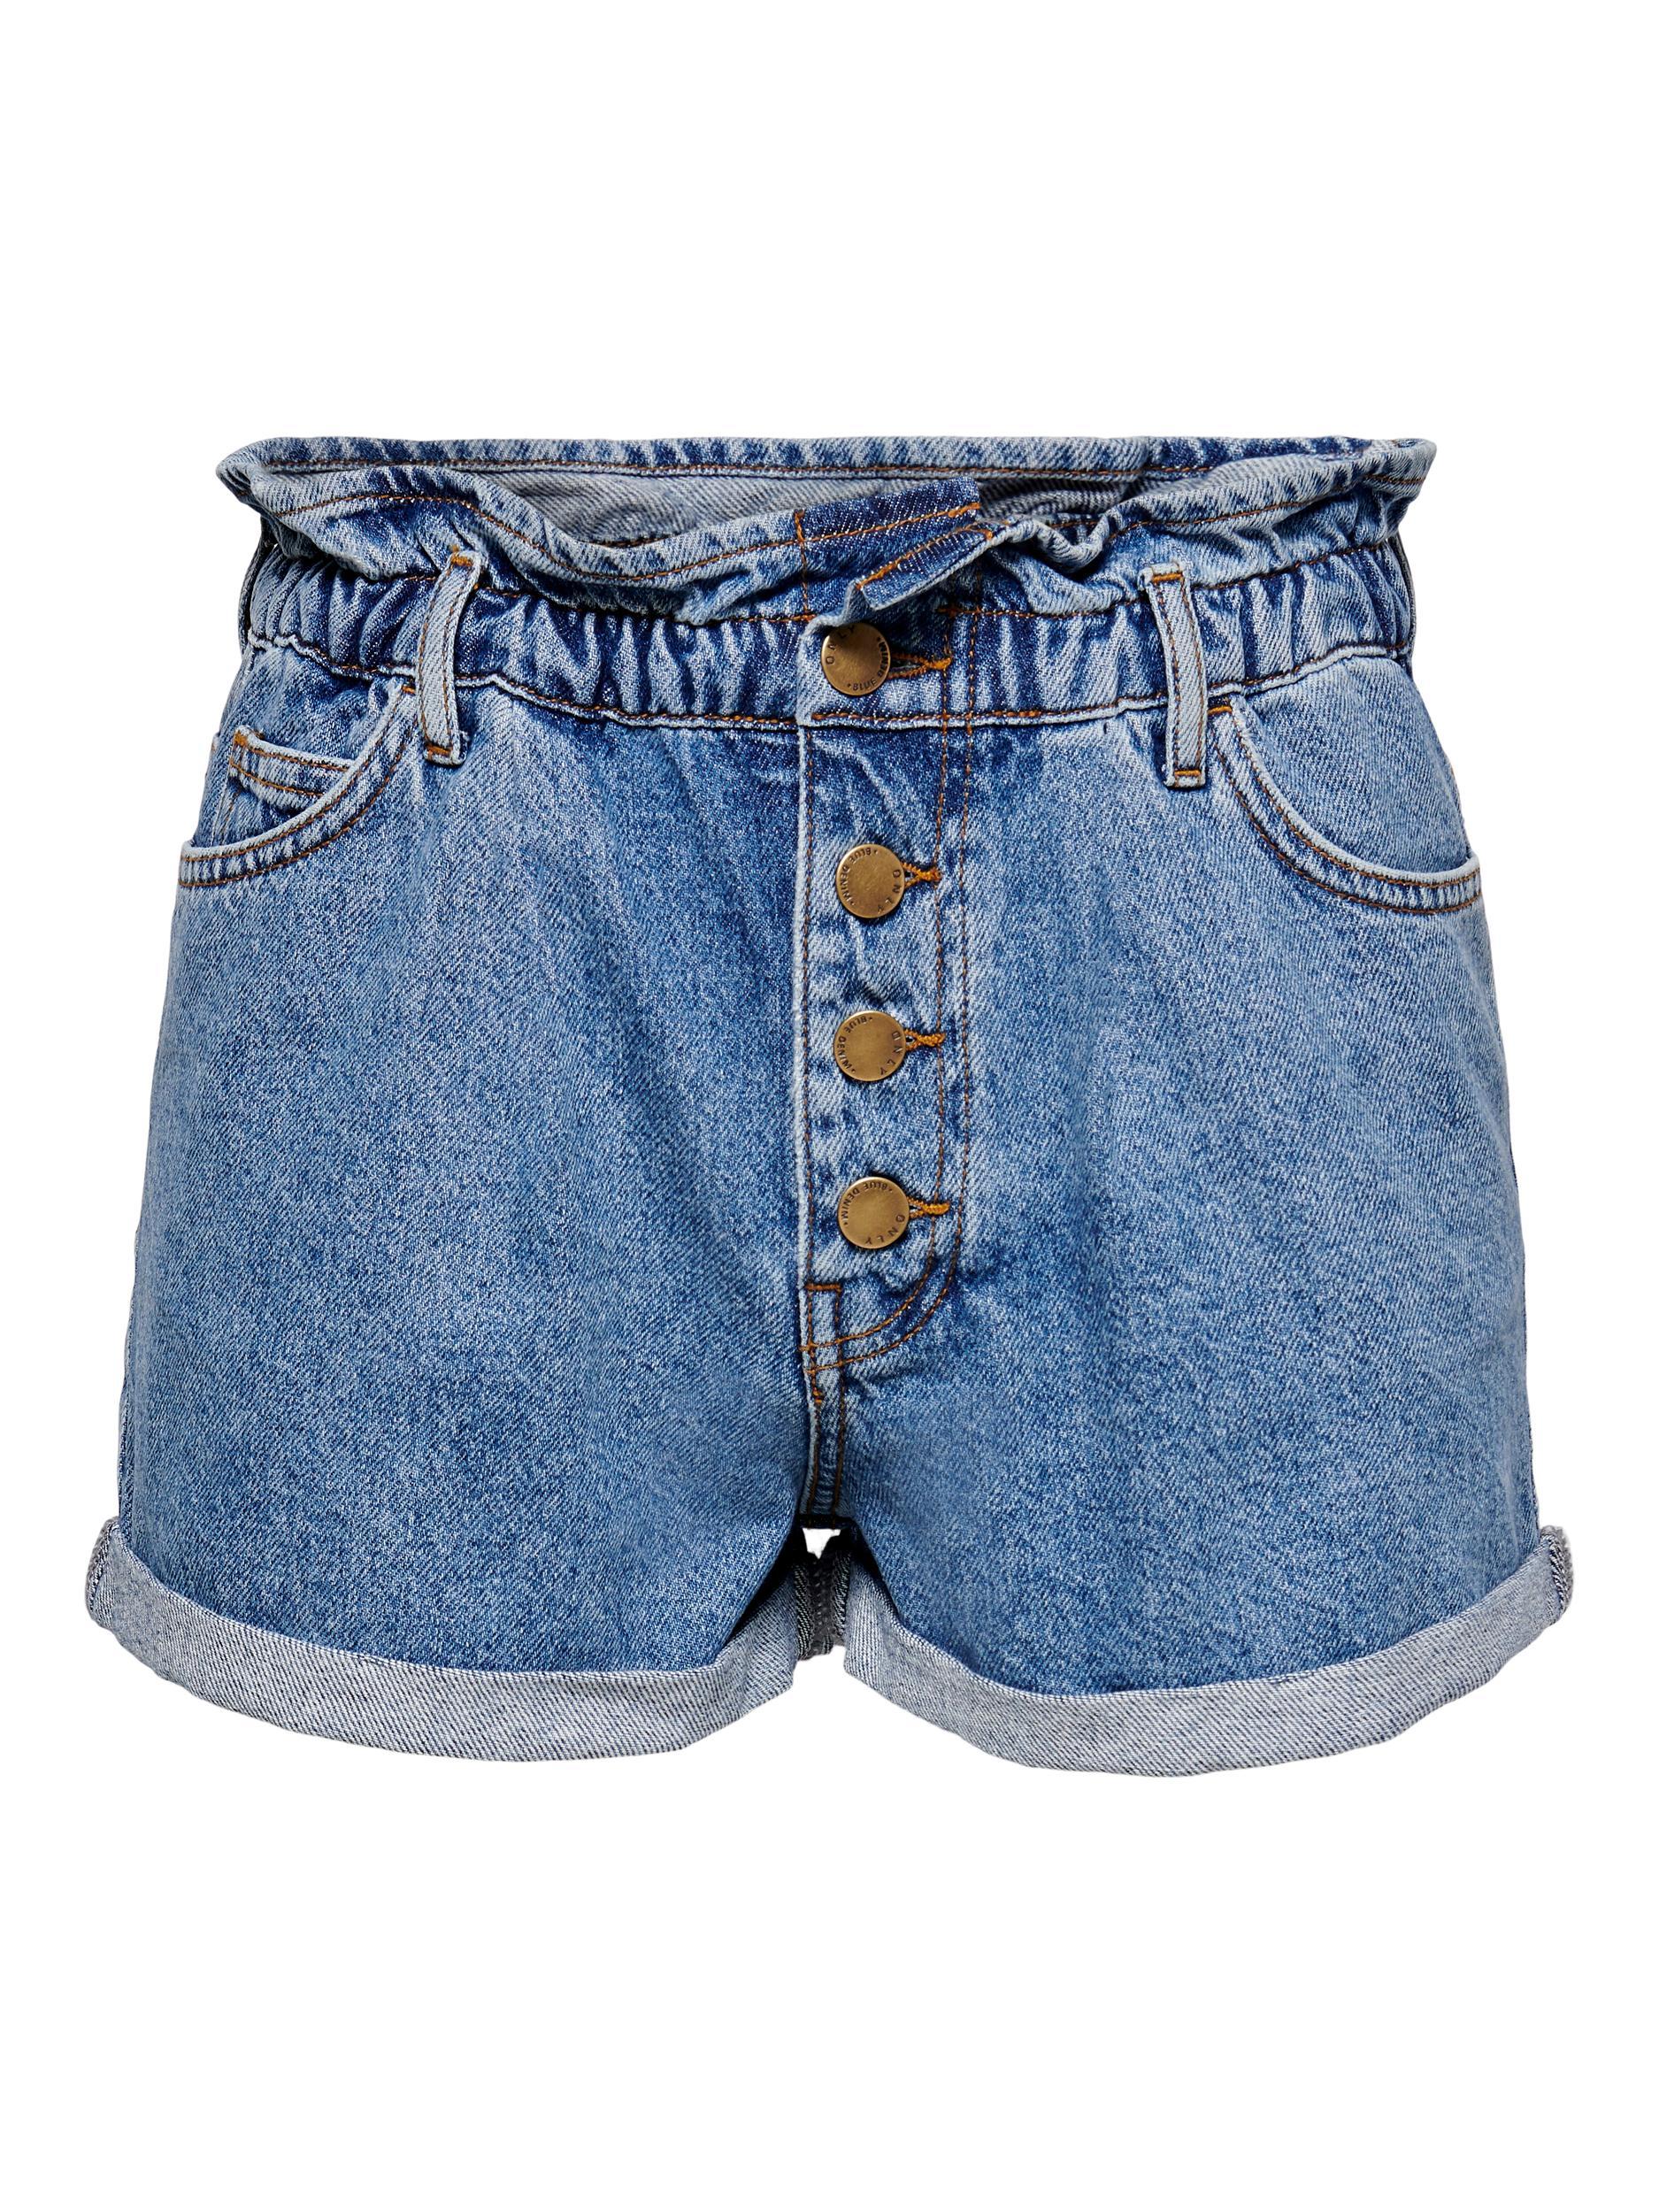 ONLCUBA LIFE PAPERBAG DNM SHORTS NOOS ONLY | Shorts | 15200196MEDIUM BLUE DENIM